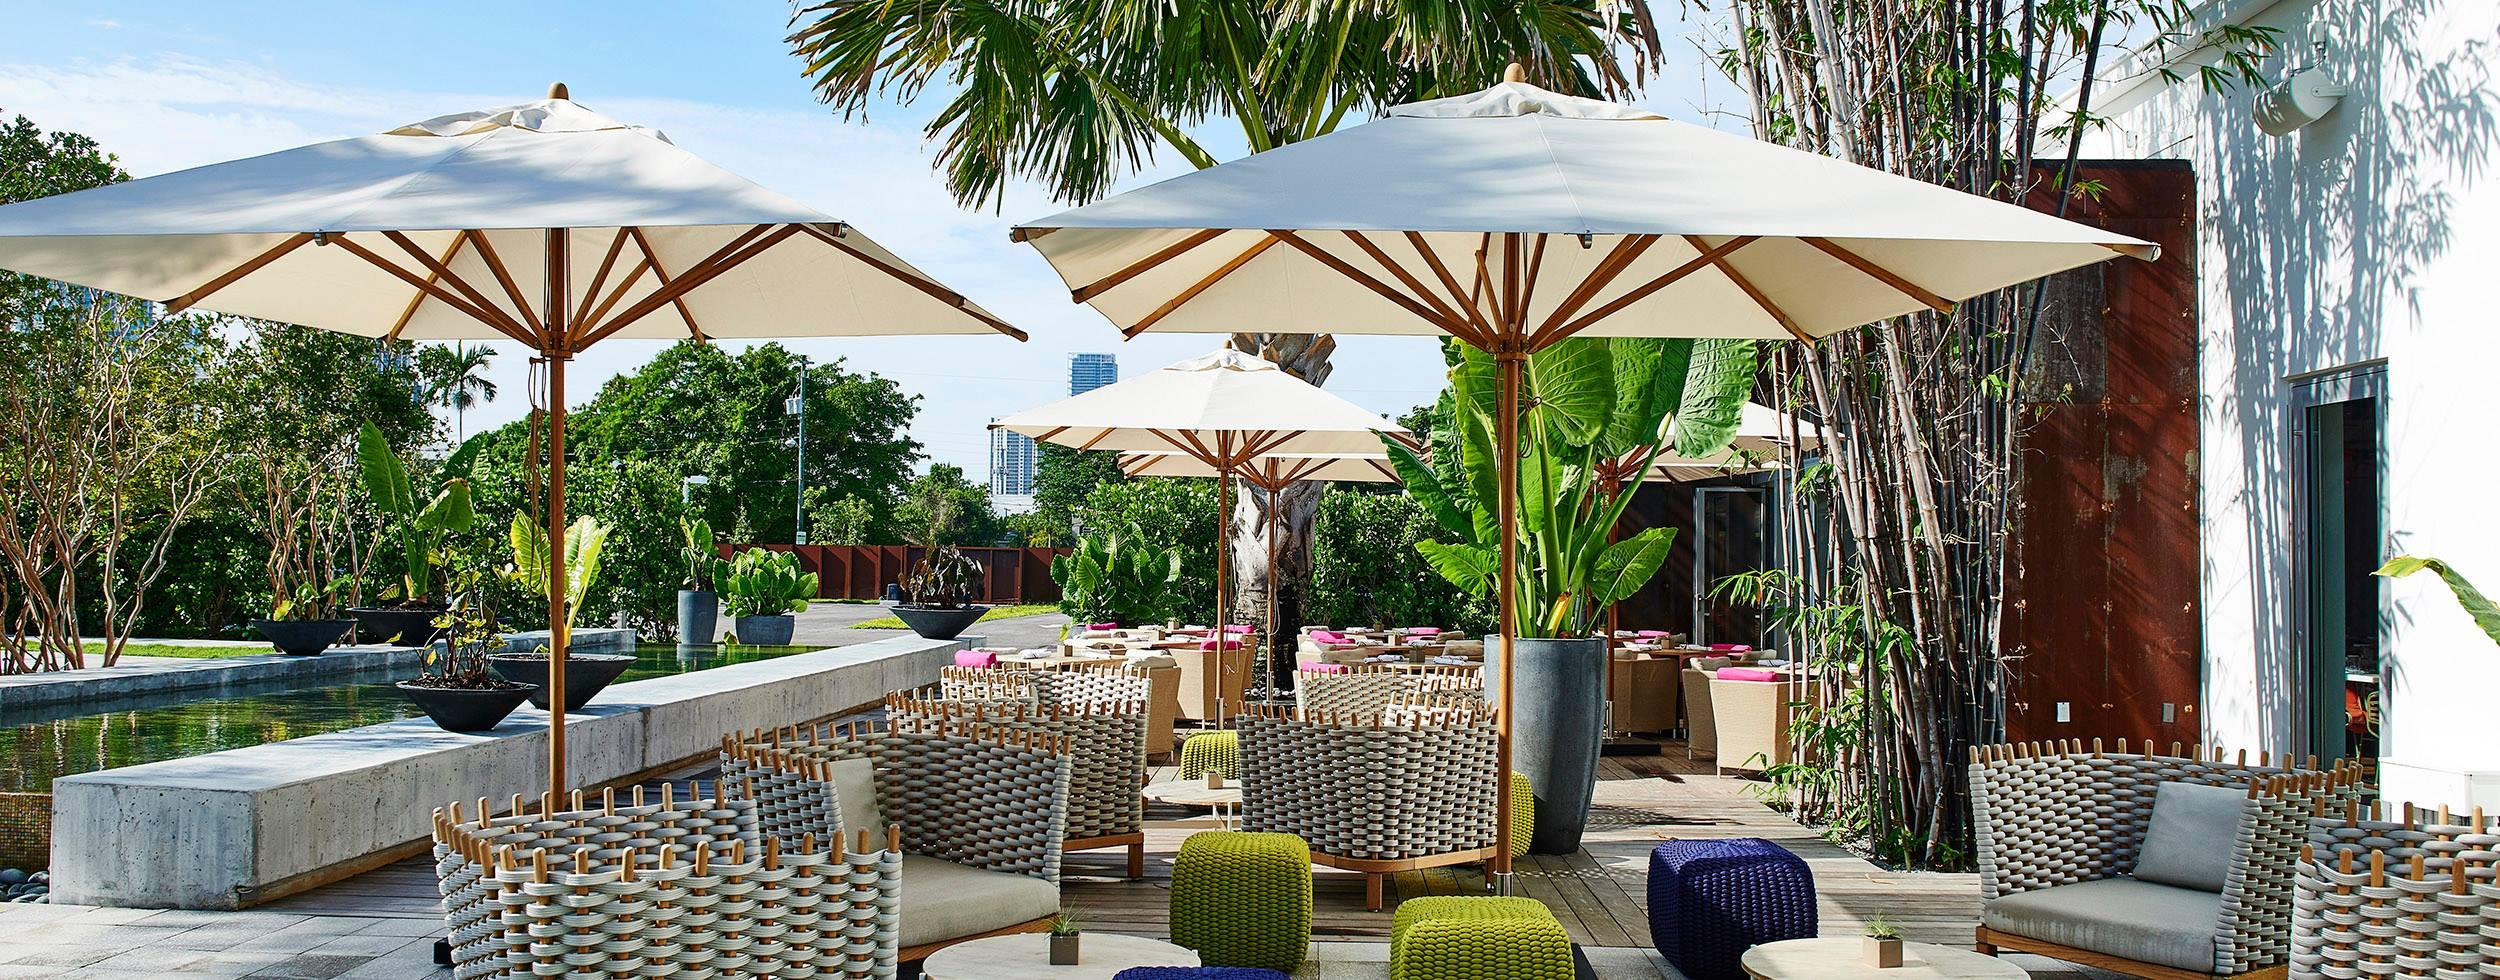 The 10' Square Levante Commercial Market Umbrella enhances the decor of this Miami hot spot.